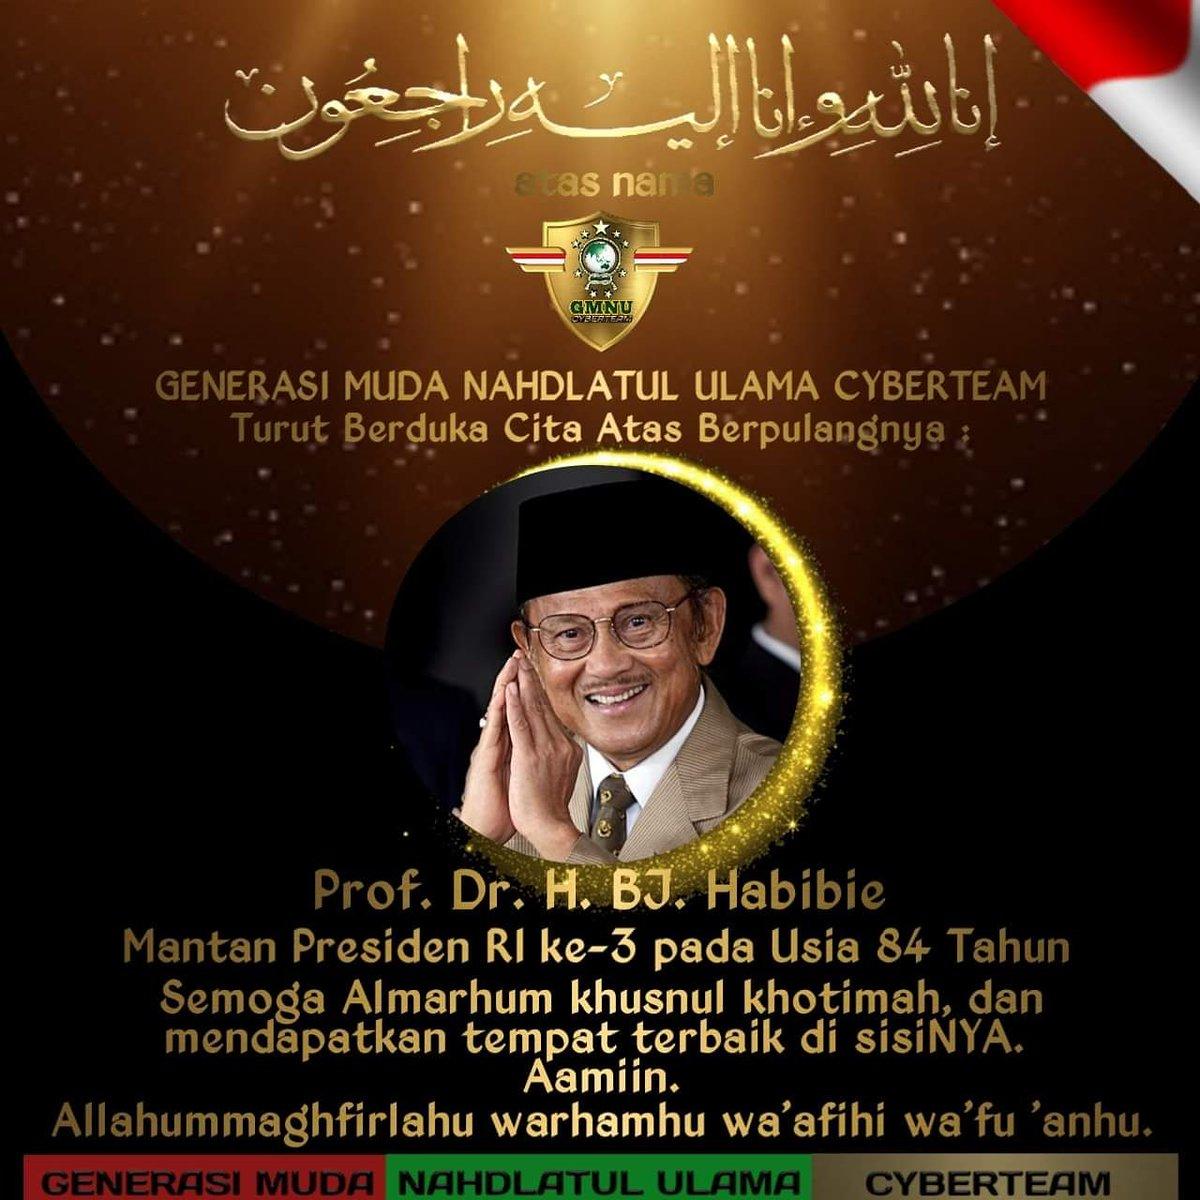 INDONESIA BERDUKA ------------------------------------ Innalillahi wa innailaihi roji'un https://t.co/vmfKa0U2EL